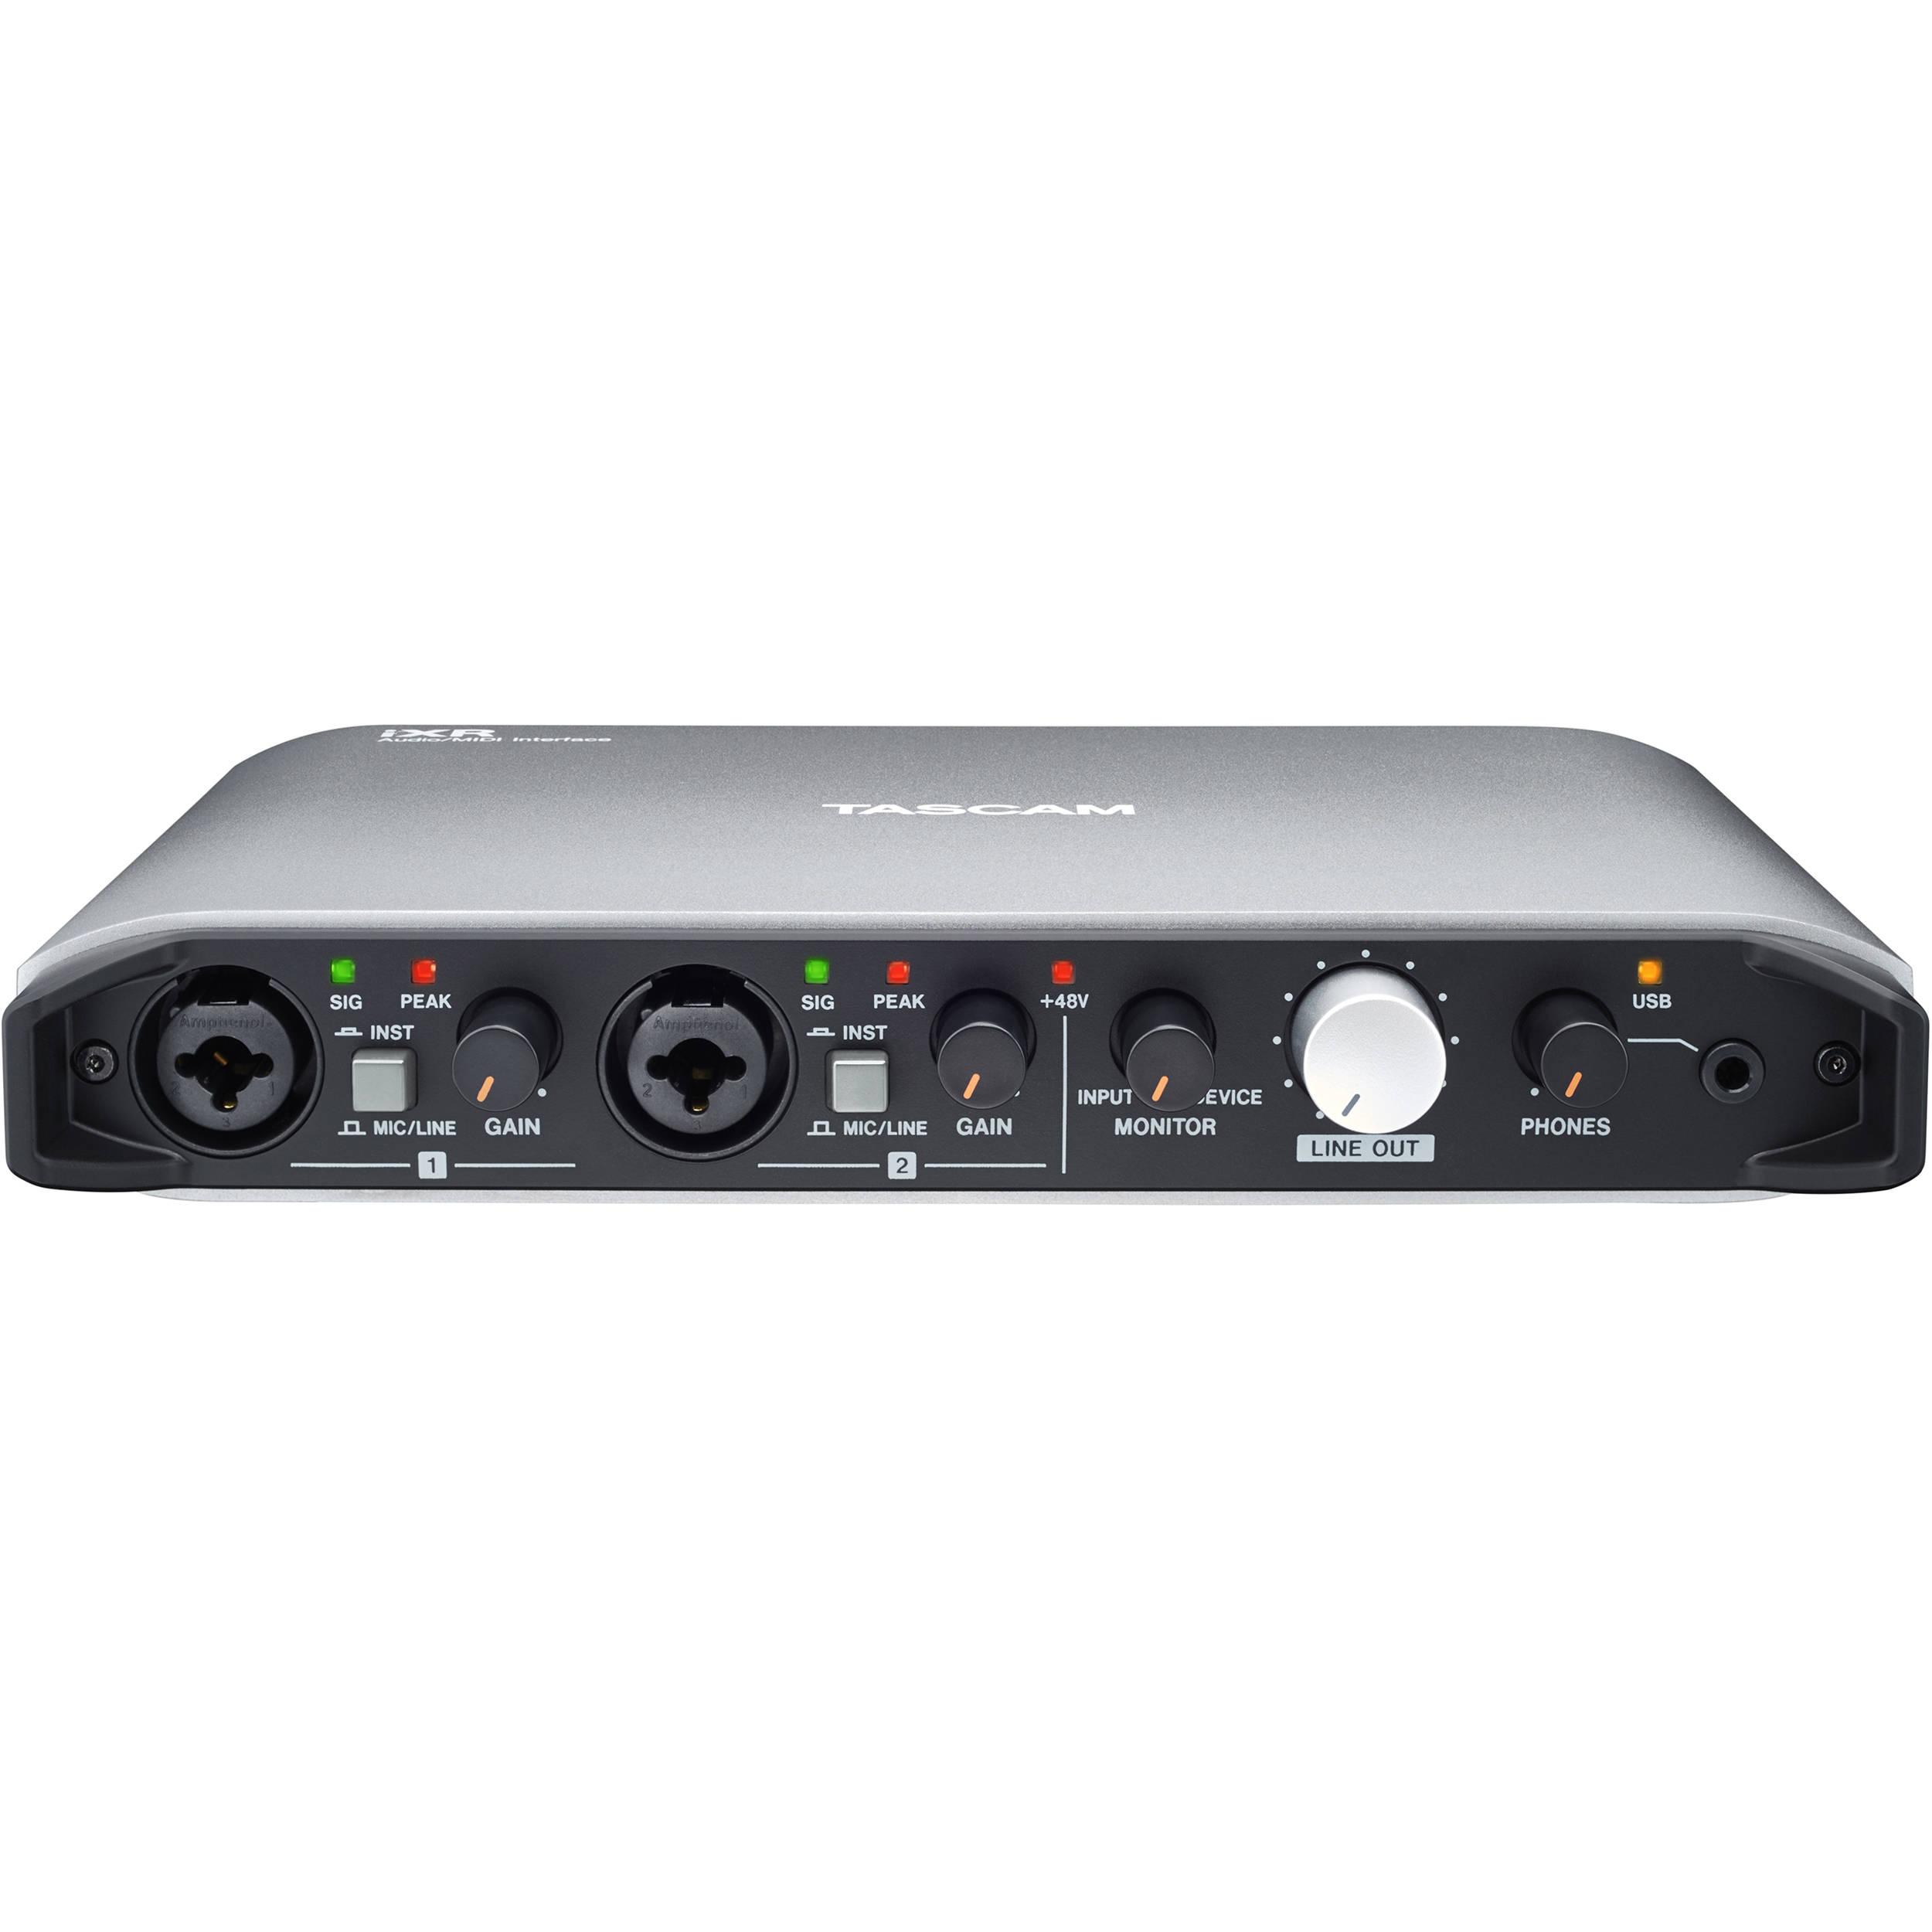 Tascam iXR USB Audio/MIDI Interface With iOS Connectivity